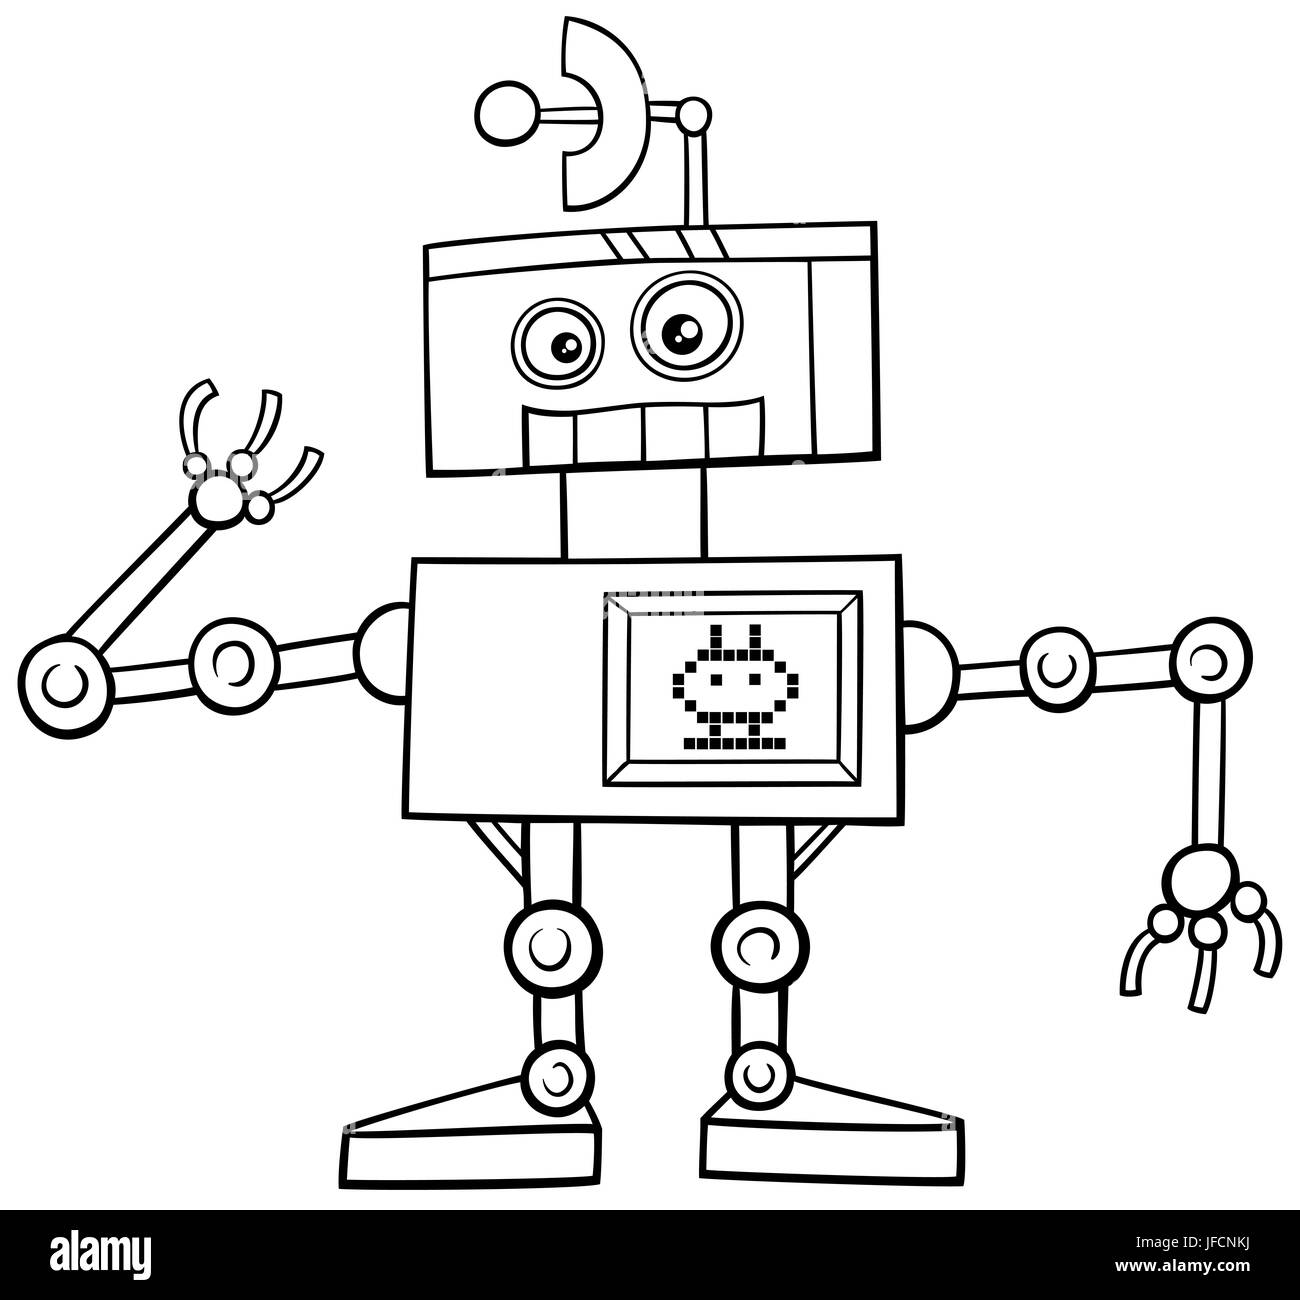 Carácter De Robot Página Para Colorear Foto Imagen De Stock